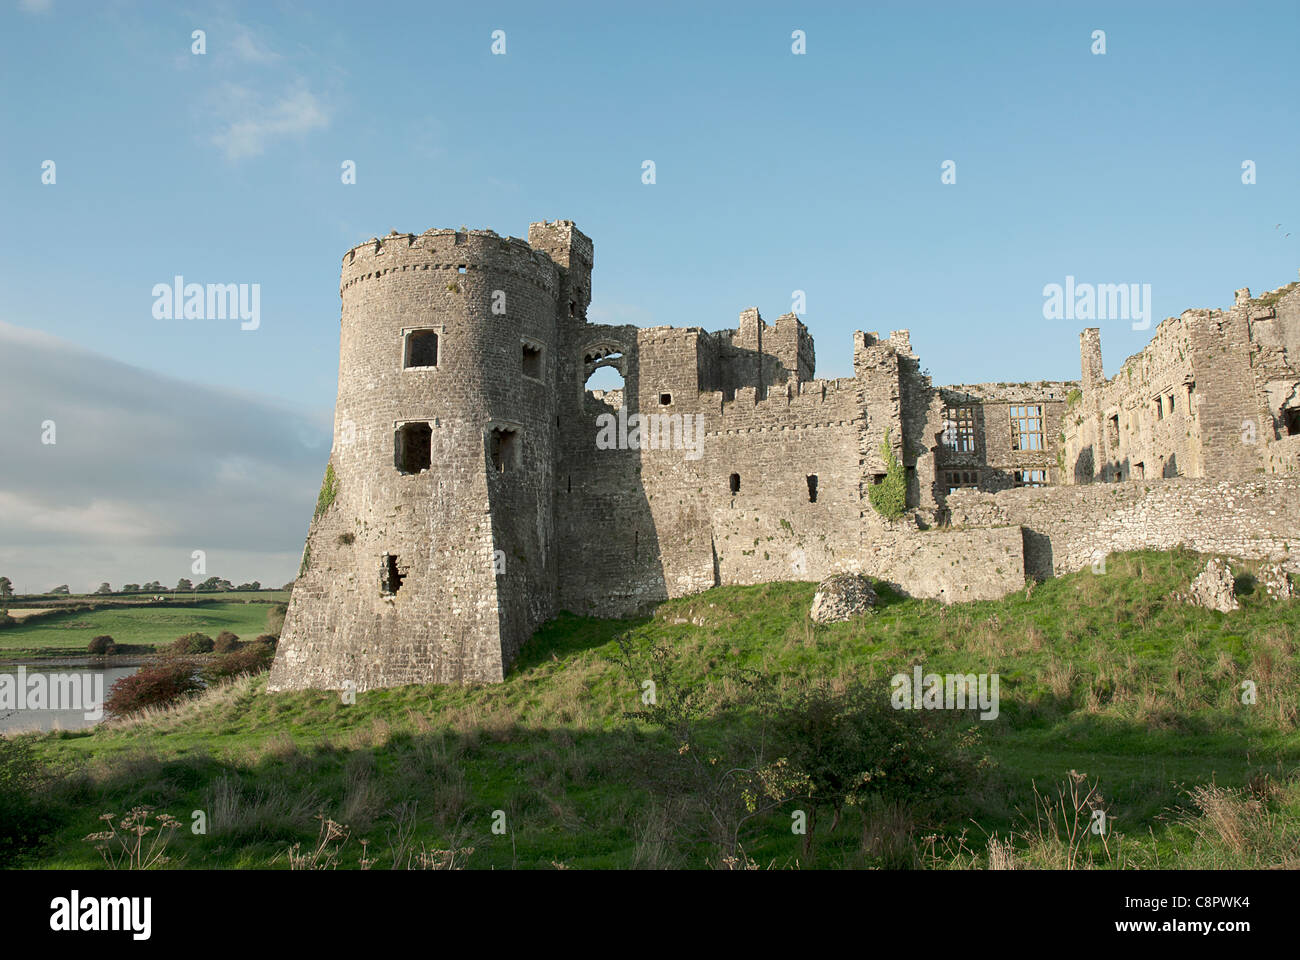 Great Britain, Wales, Pembrokeshire, Carew, Carew Castle - Stock Image